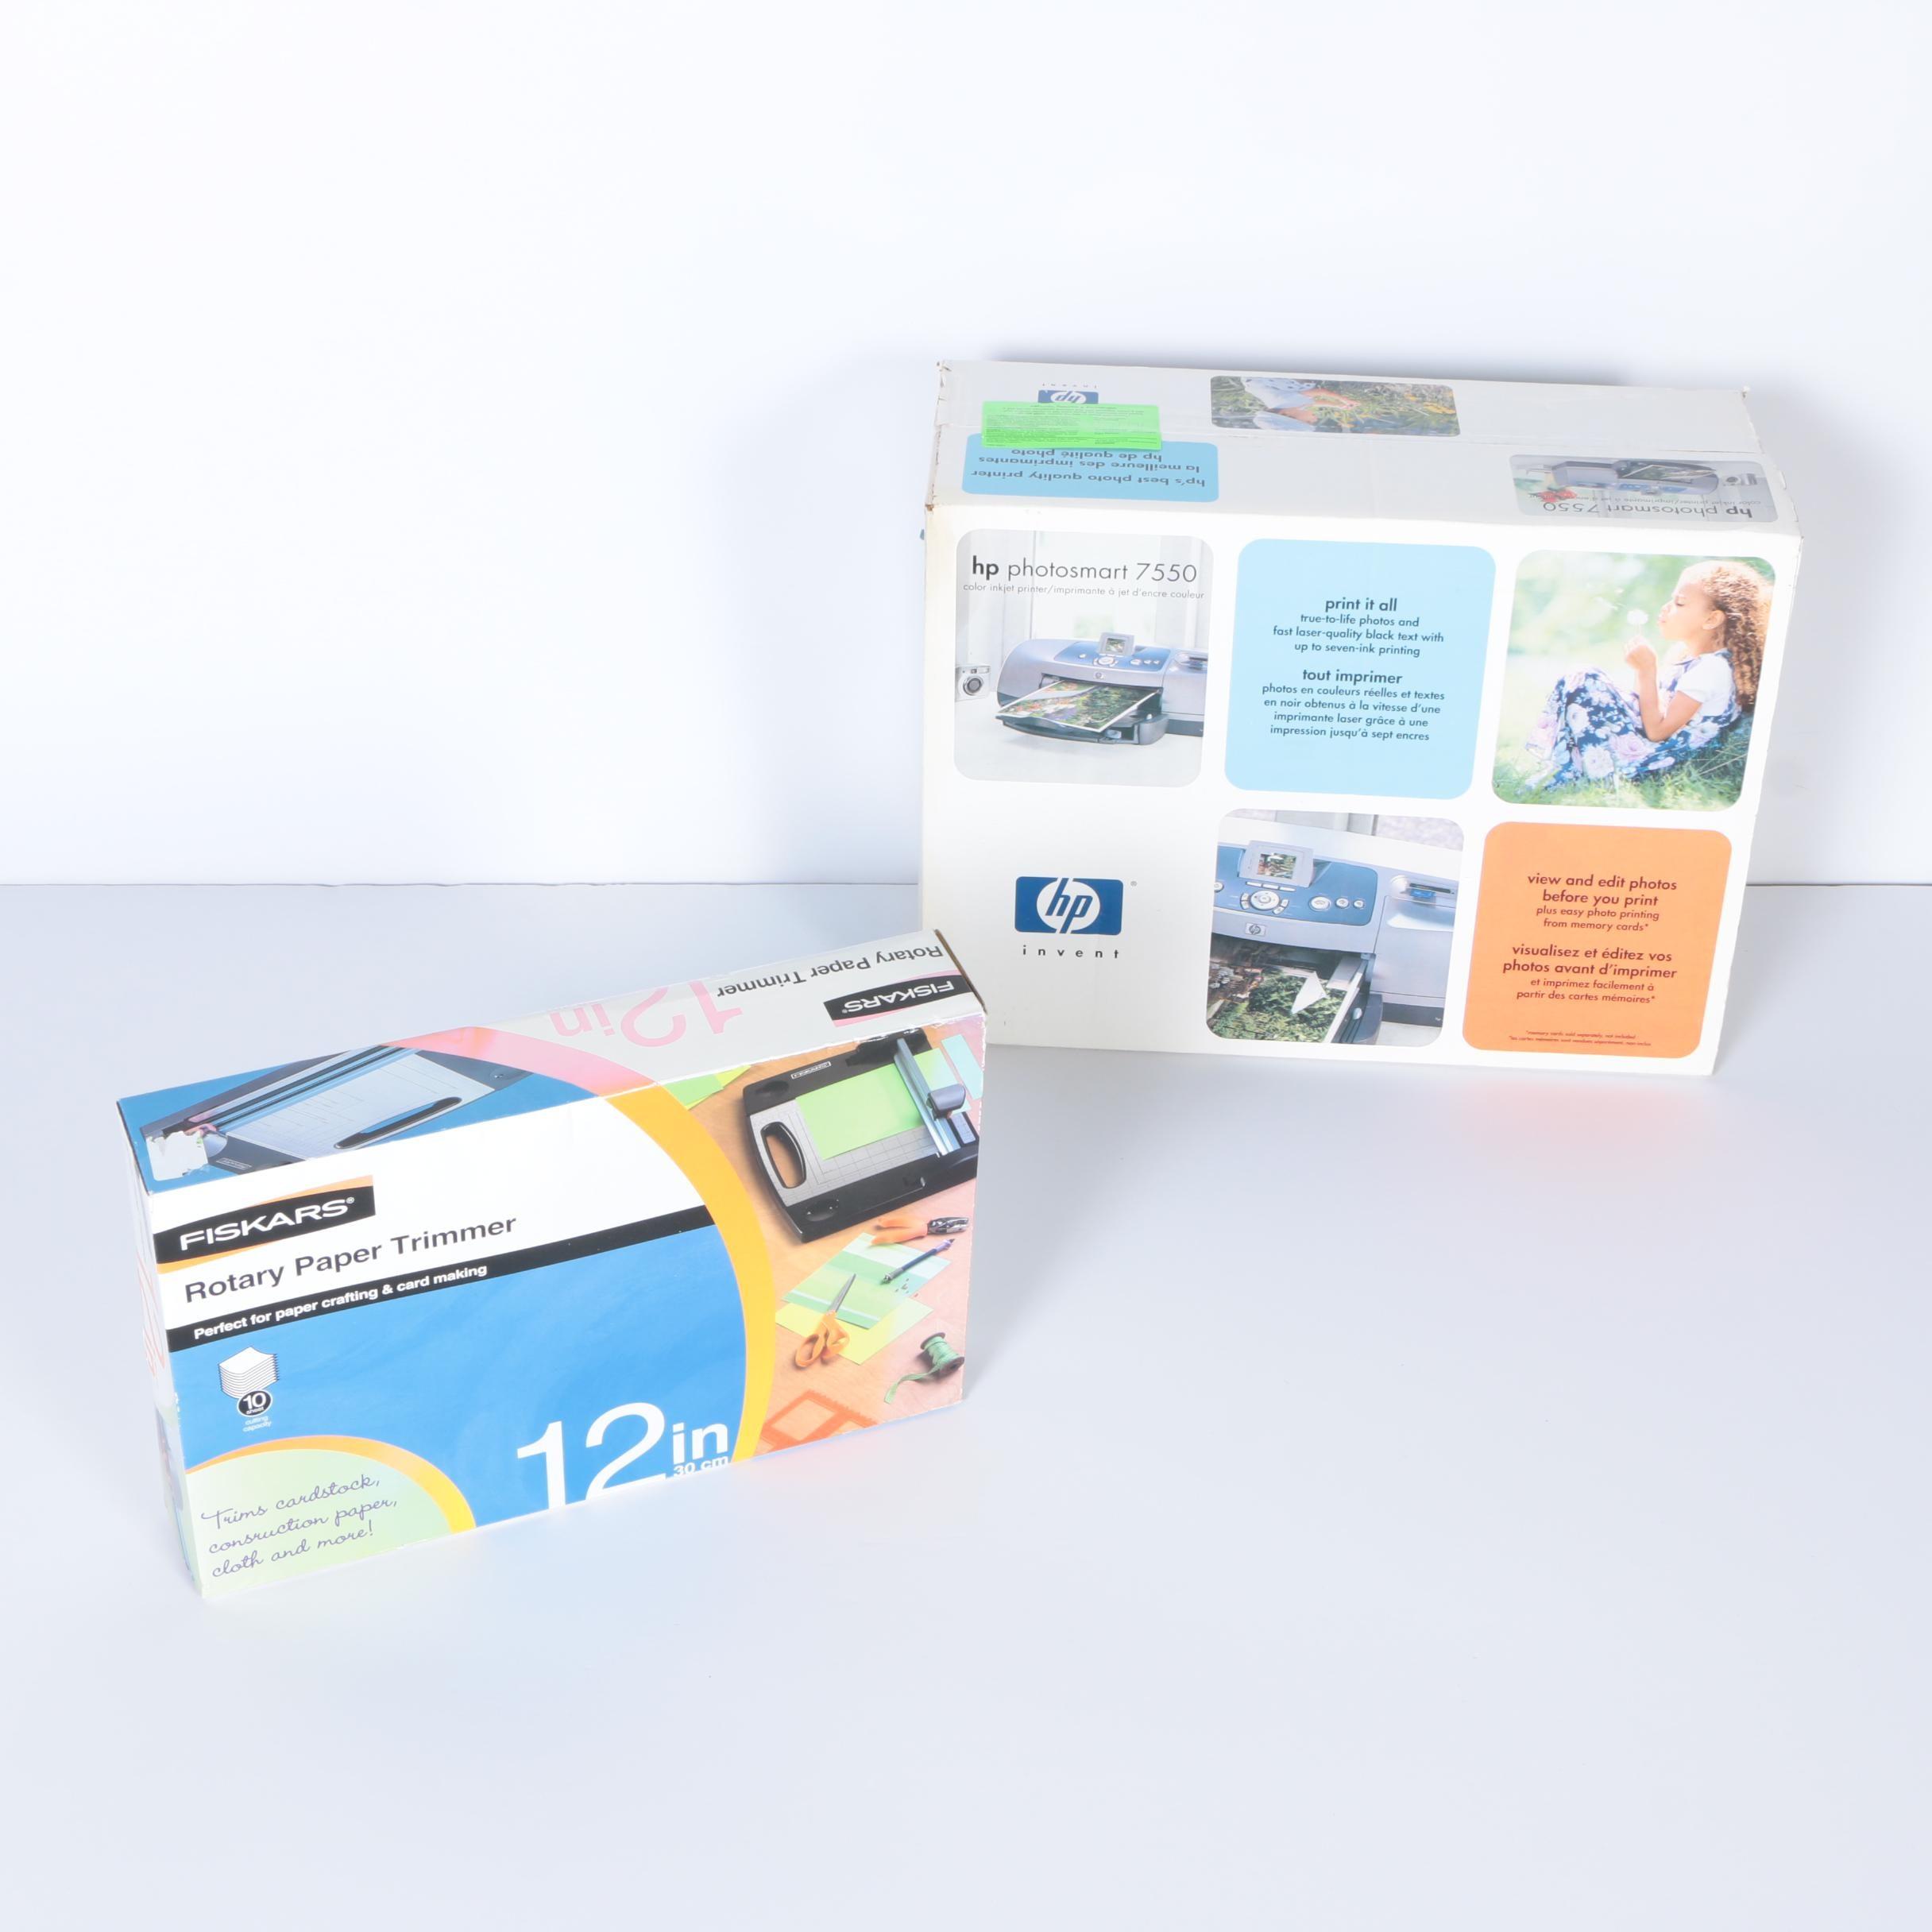 Fiskars Rotary Paper Trimmer and HP Color Inkjet Printer